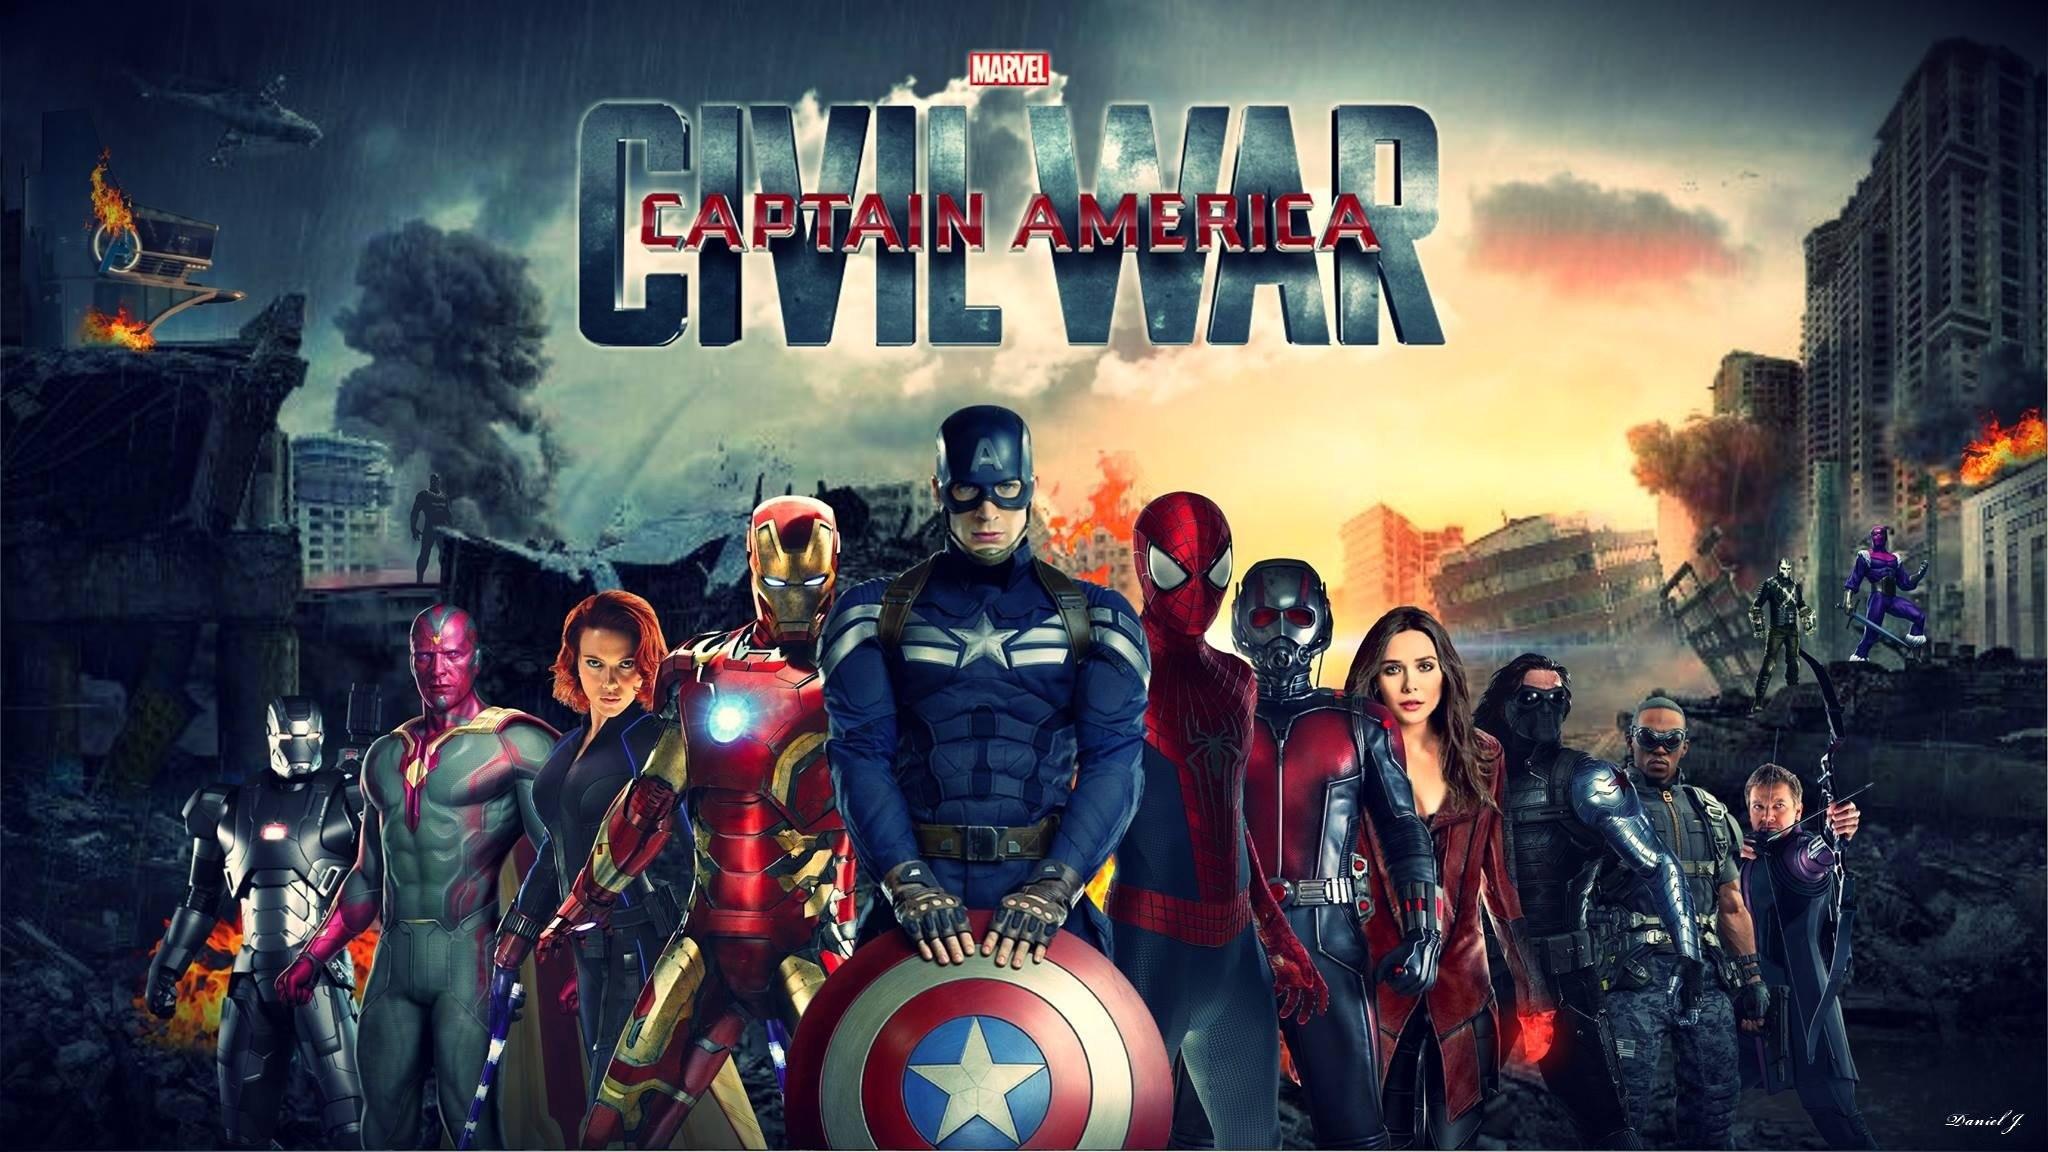 Civil War Wallpaper Civil War Wallpapers Apps   HD Wallpapers   Pinterest    Marvel civil war, Civil wars and 3d wallpaper